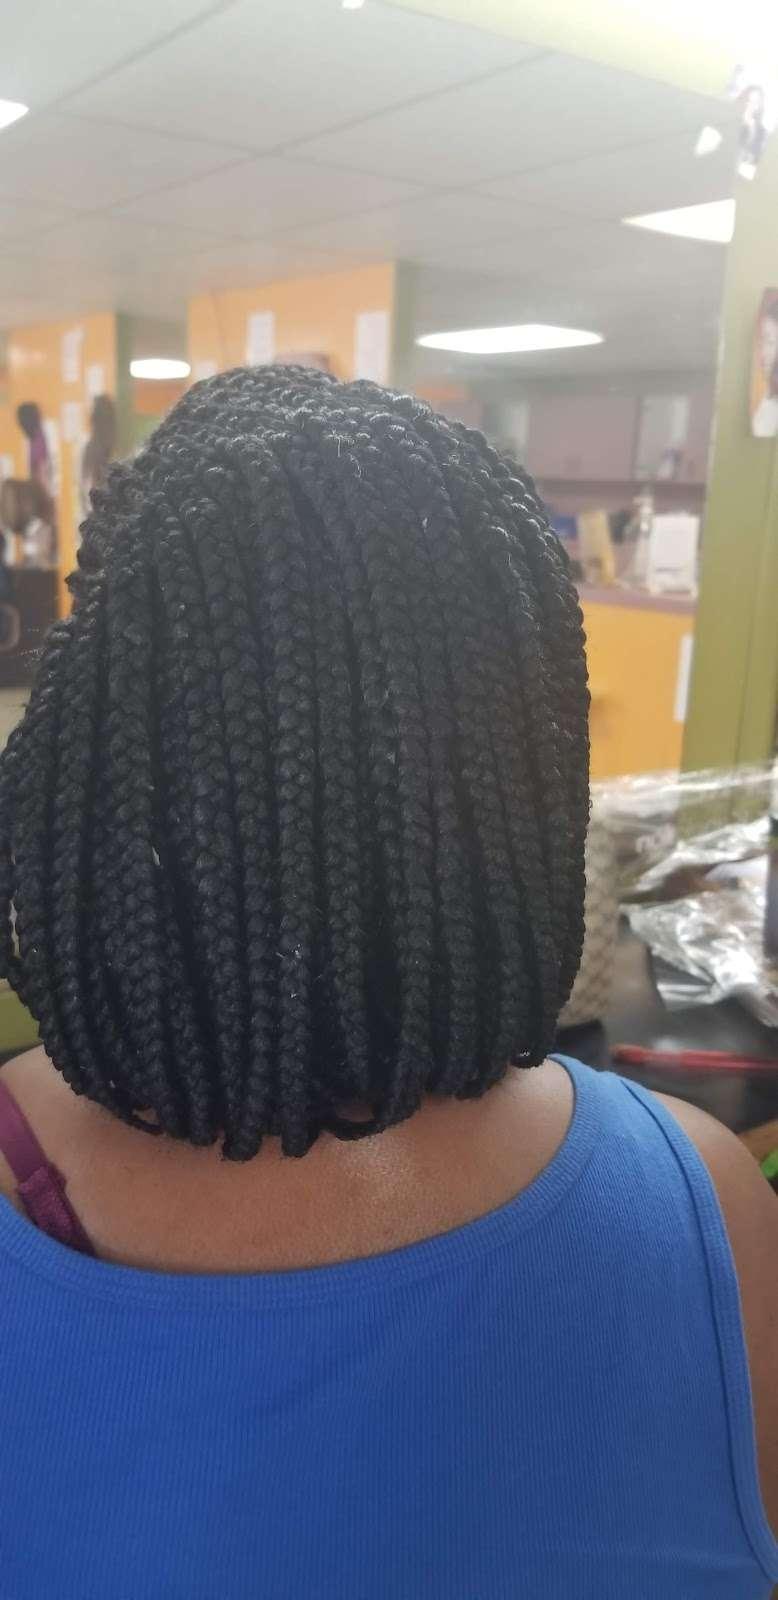 Lallas Braiding - hair care  | Photo 7 of 10 | Address: 5718 Aldine Bender Rd, Houston, TX 77032, USA | Phone: (281) 442-1331